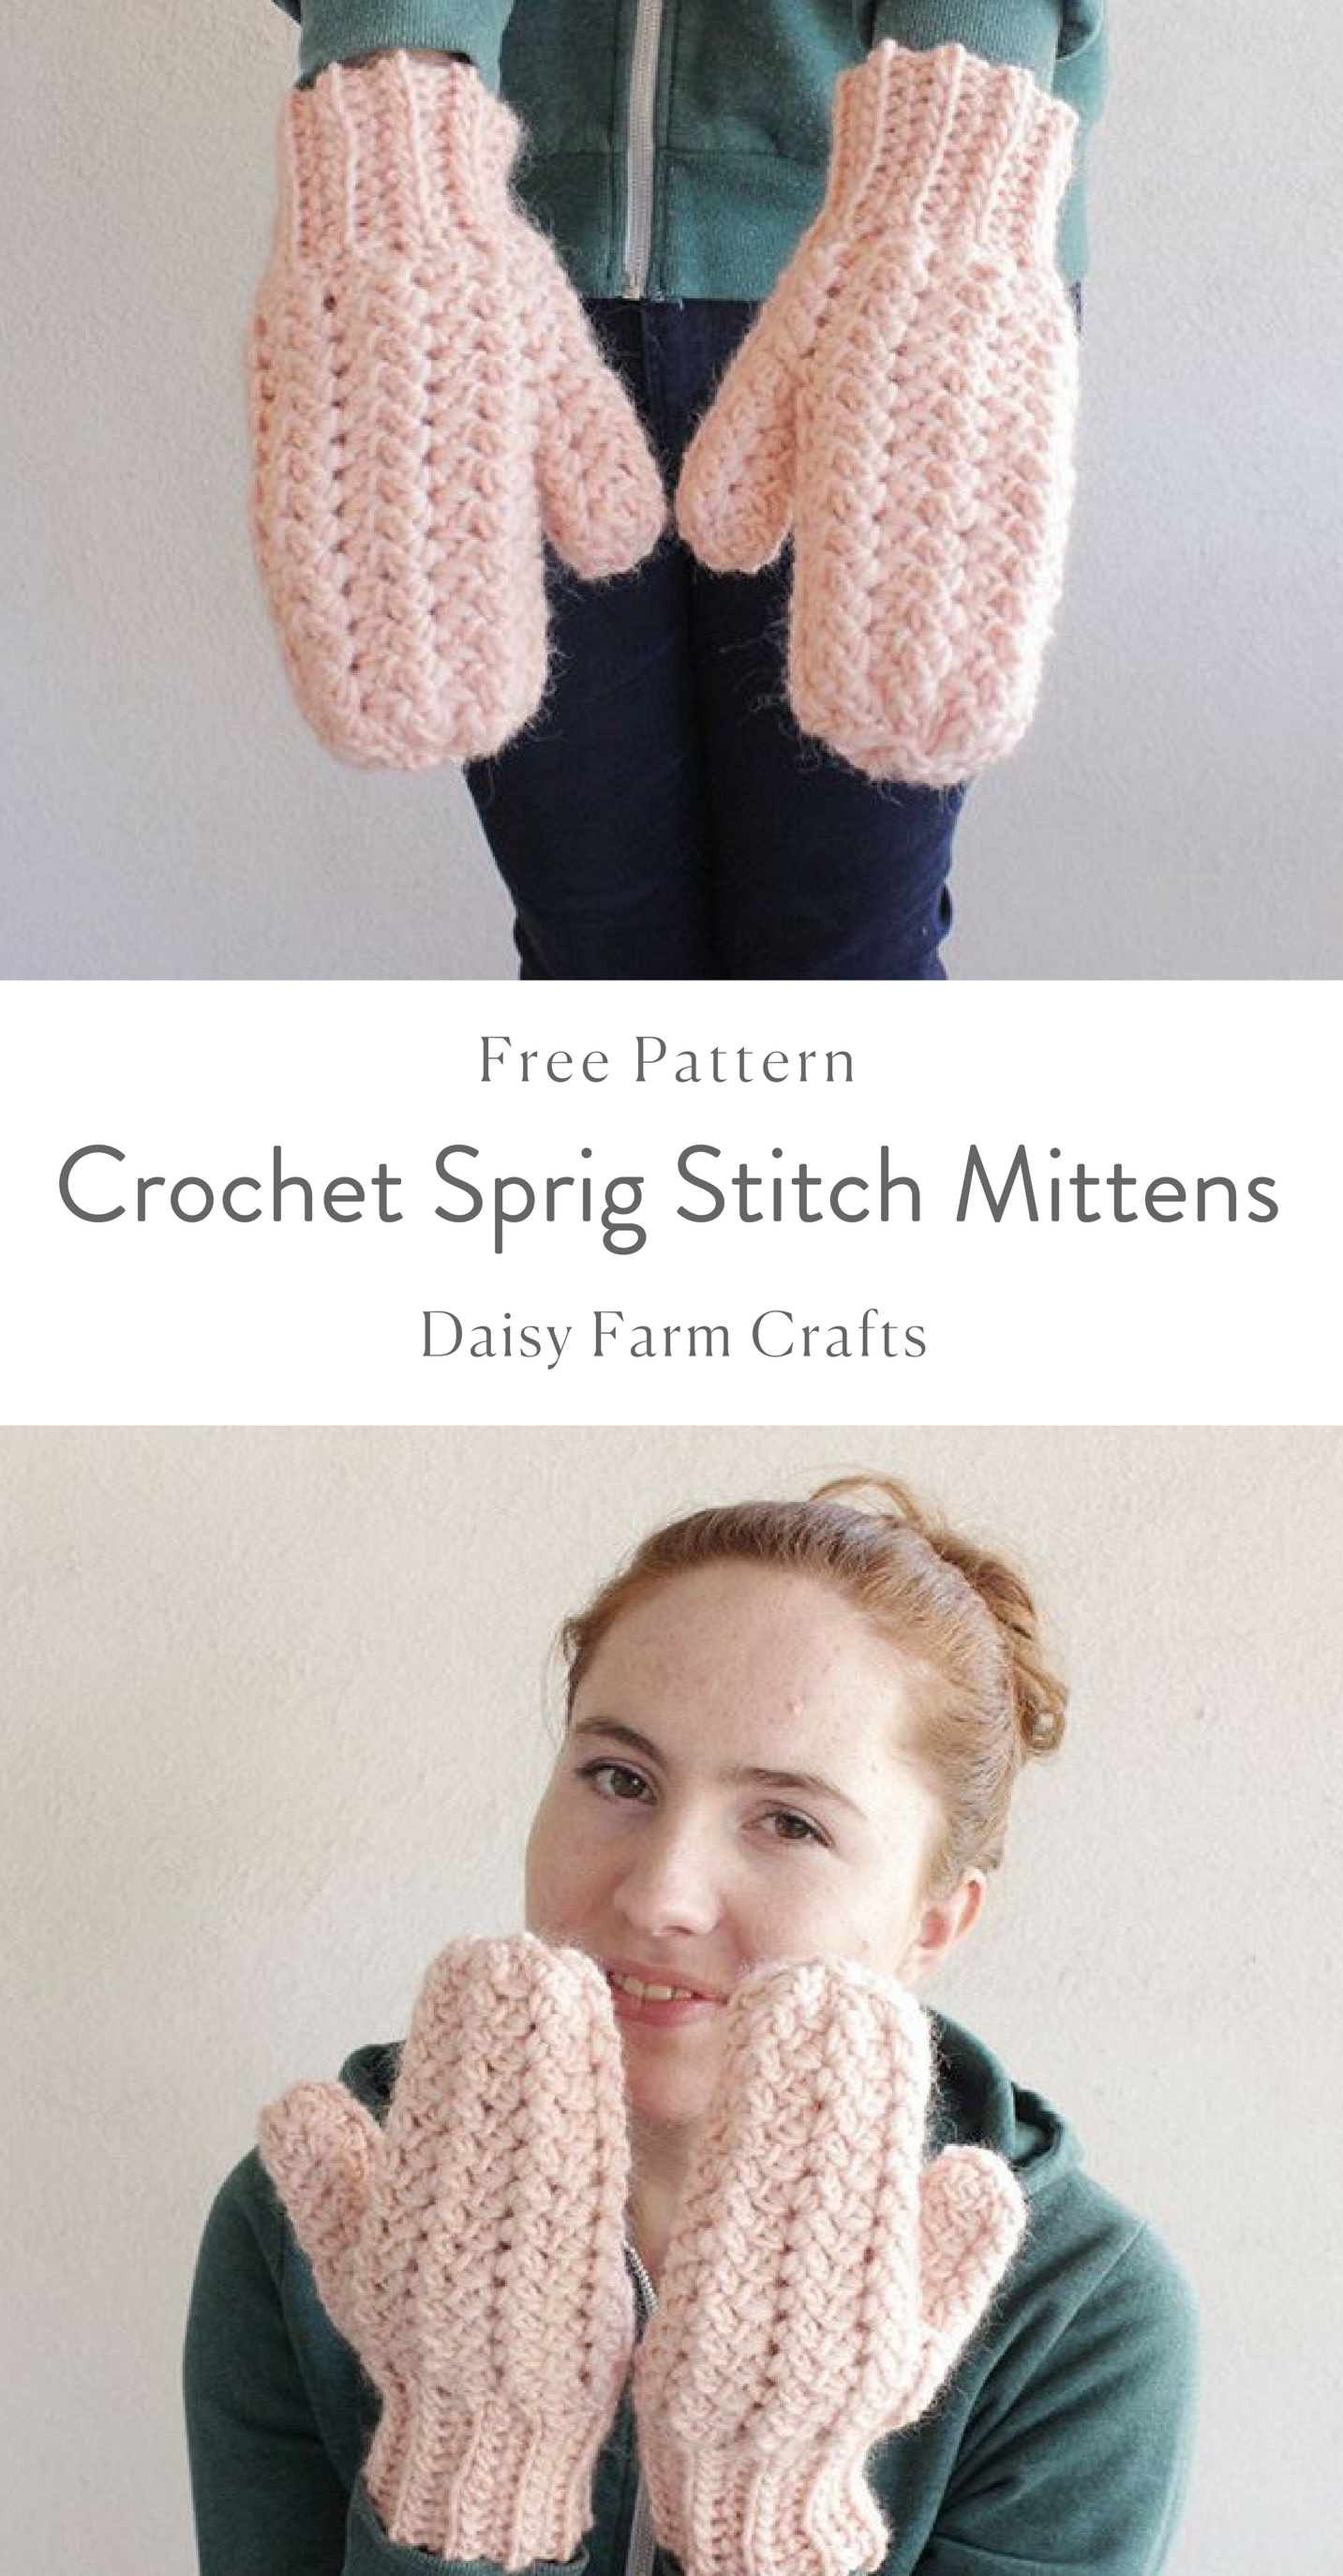 Crochet Sprig Stitch Mittens - Daisy Farm Crafts | Crochet ...